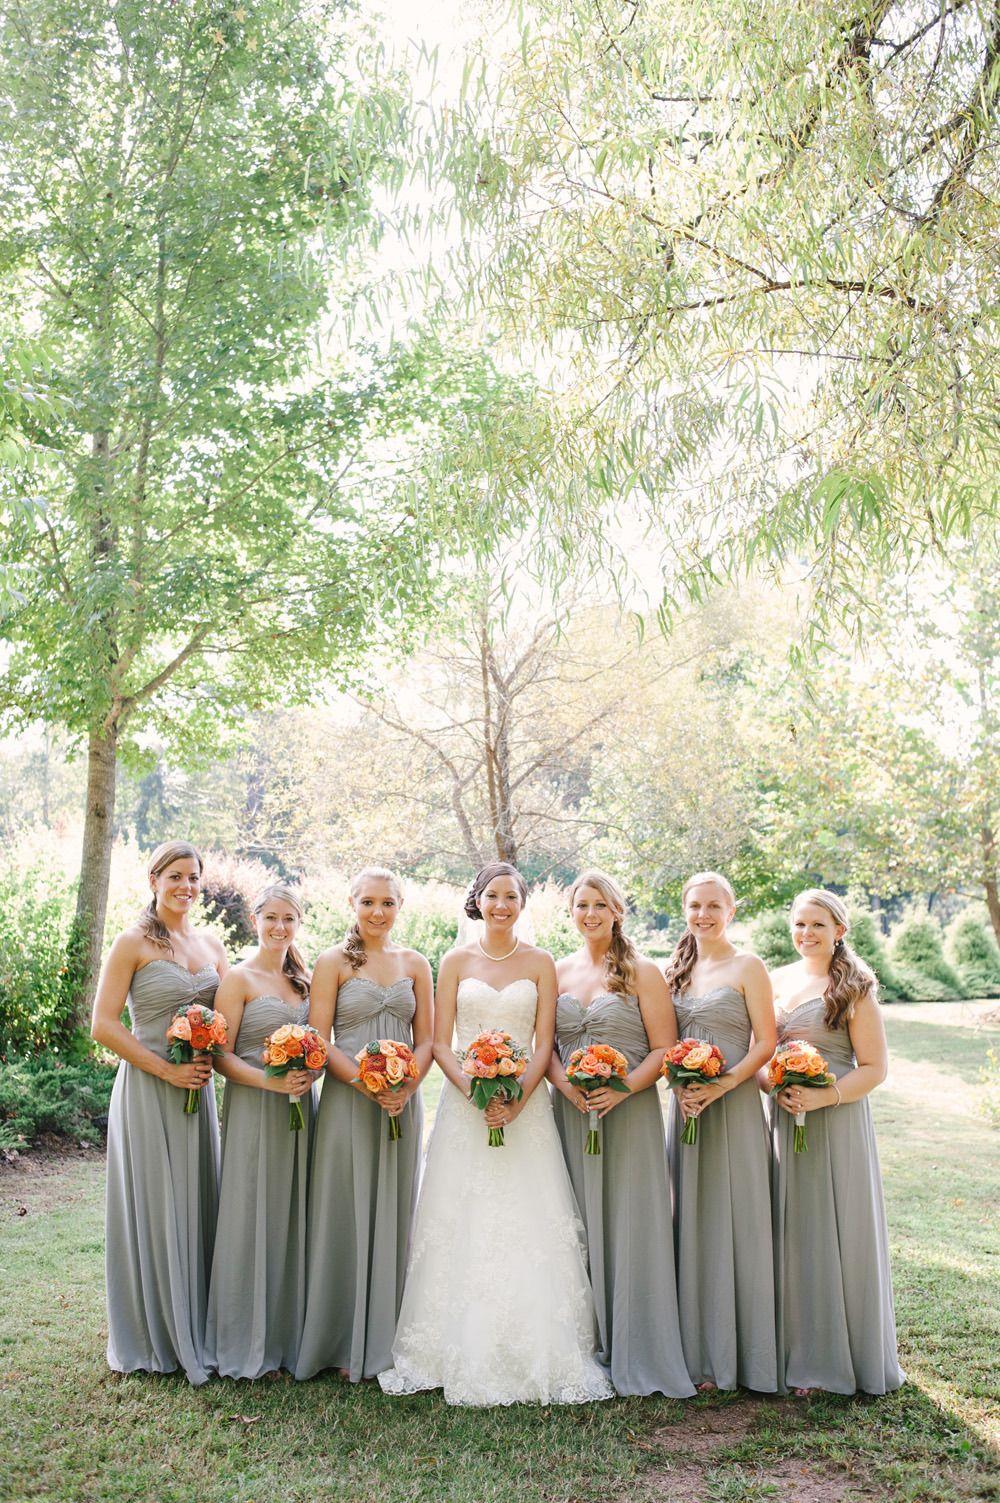 b831accd3da9e by far my favorite bridesmaids dresses i have seen